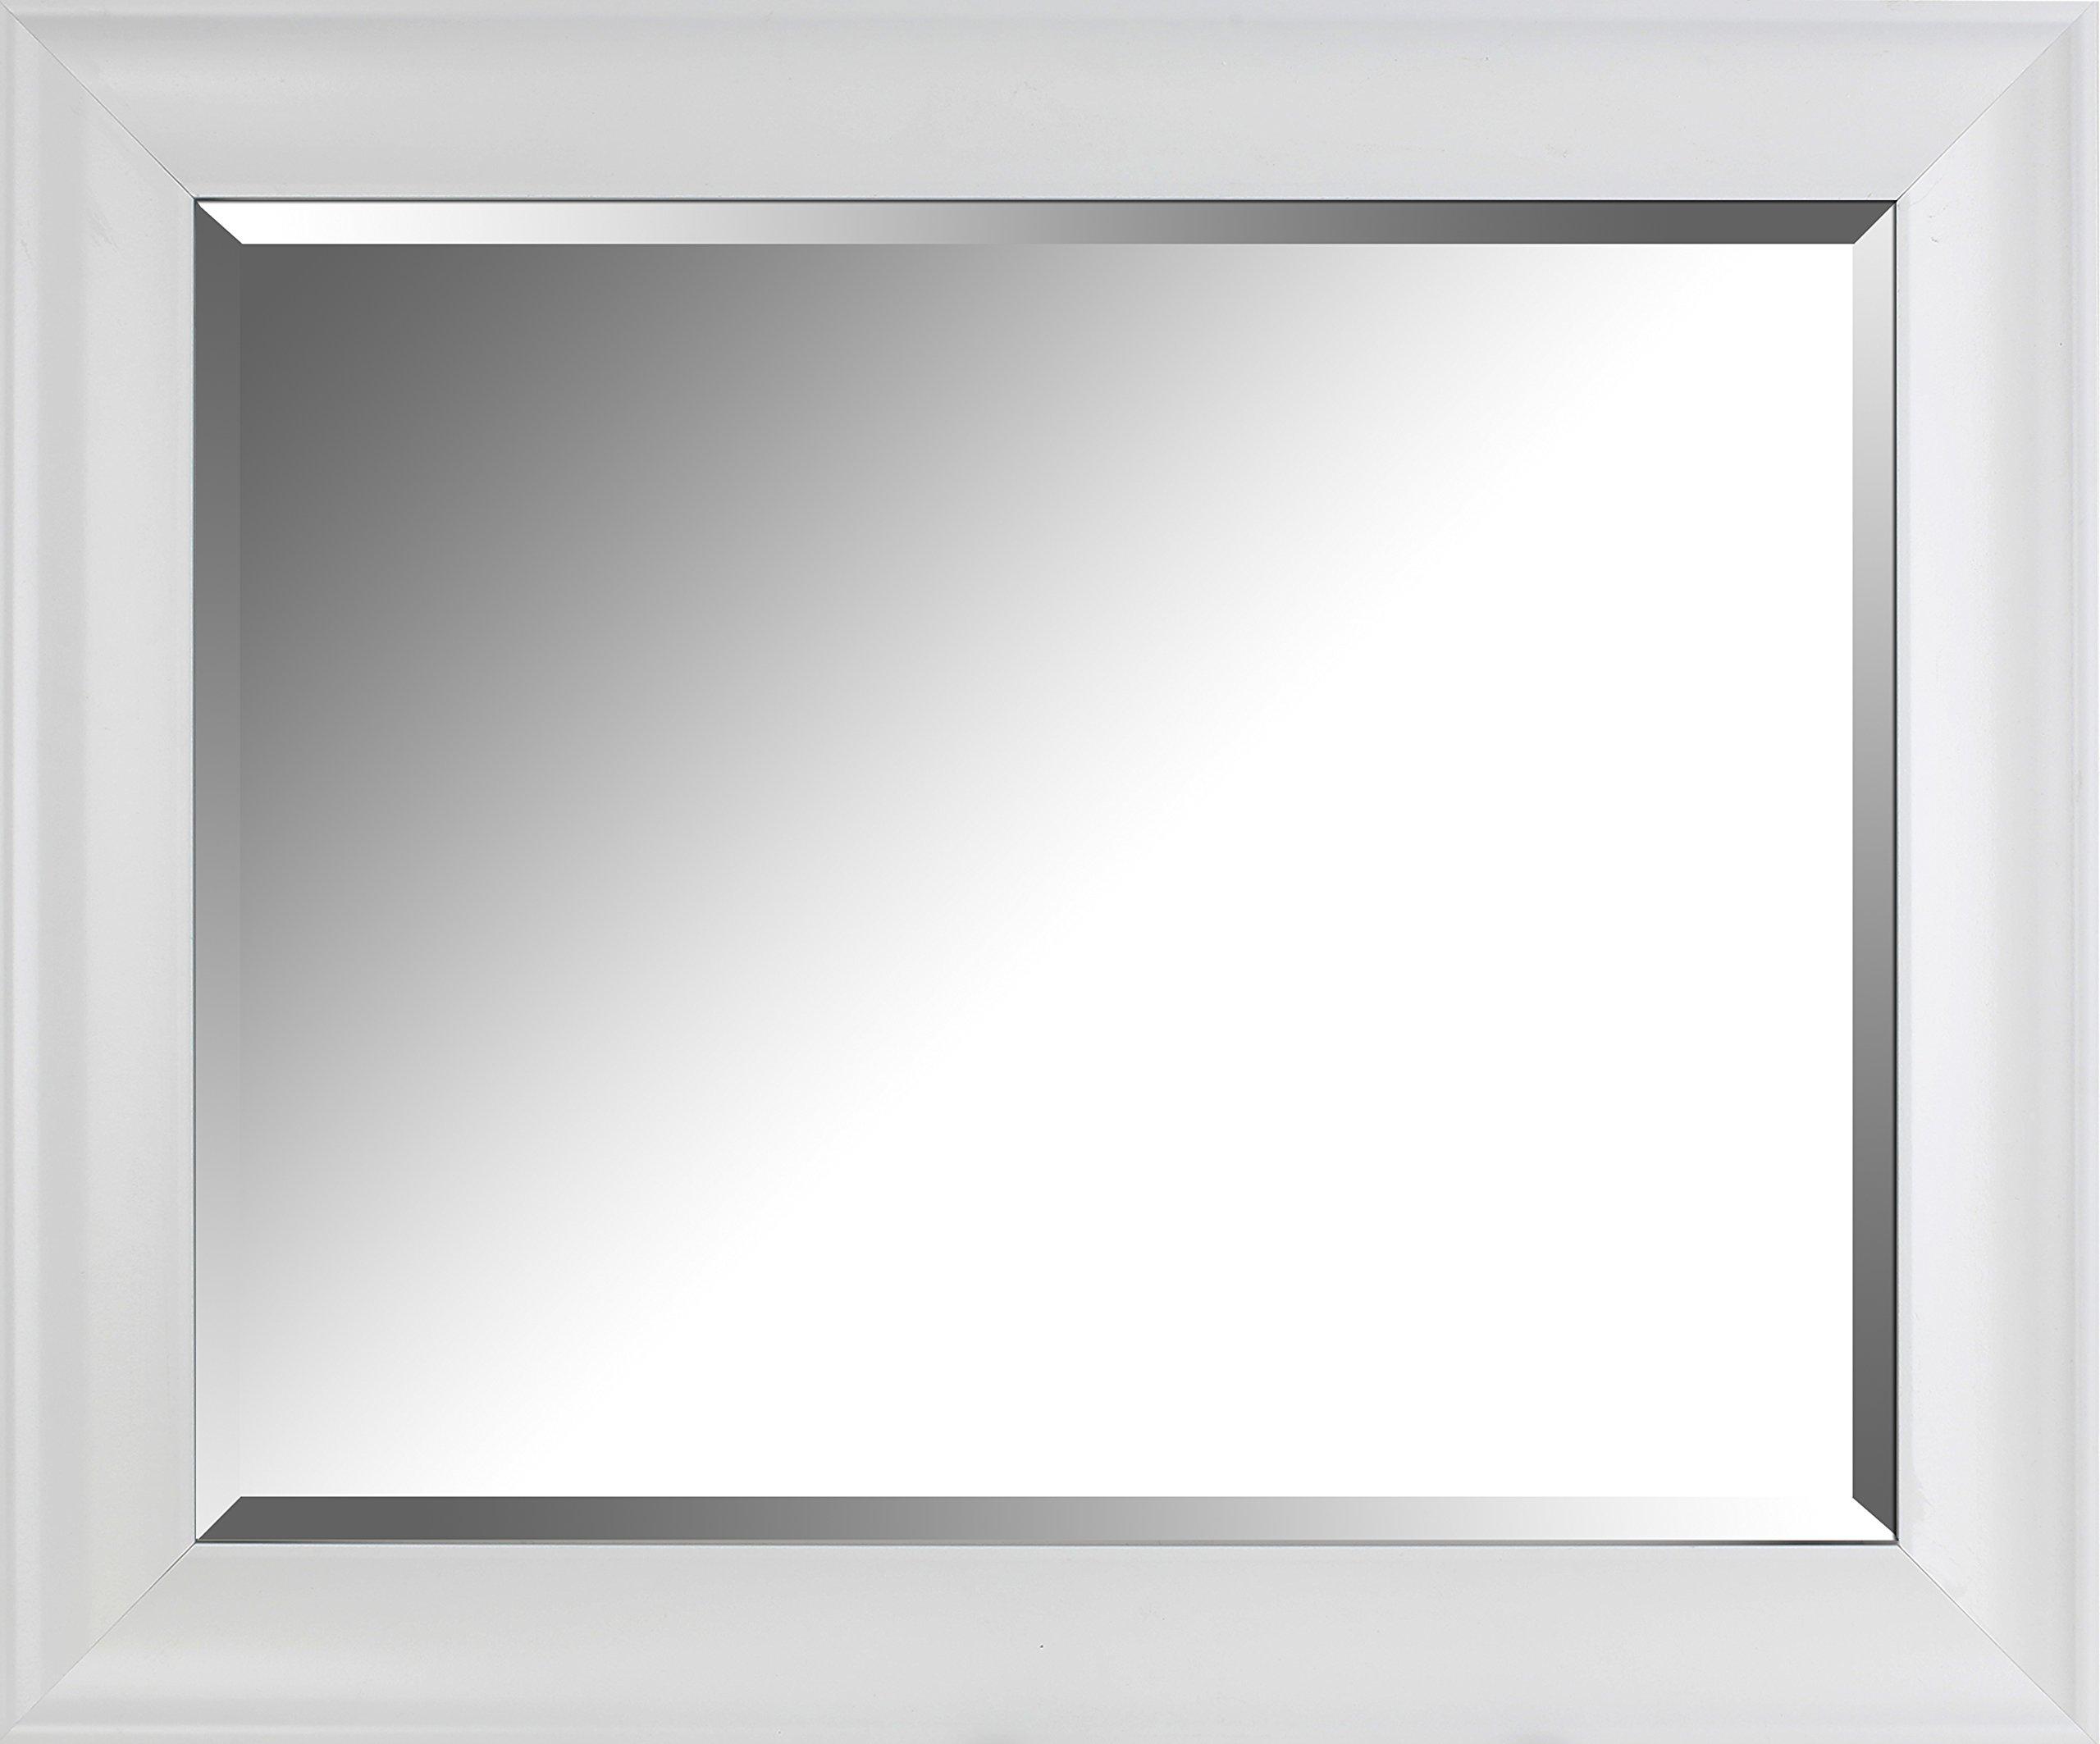 Mirrorize.ca AMACTCM49 Wall Mirror, 28.5'' x 34.5'', Clear